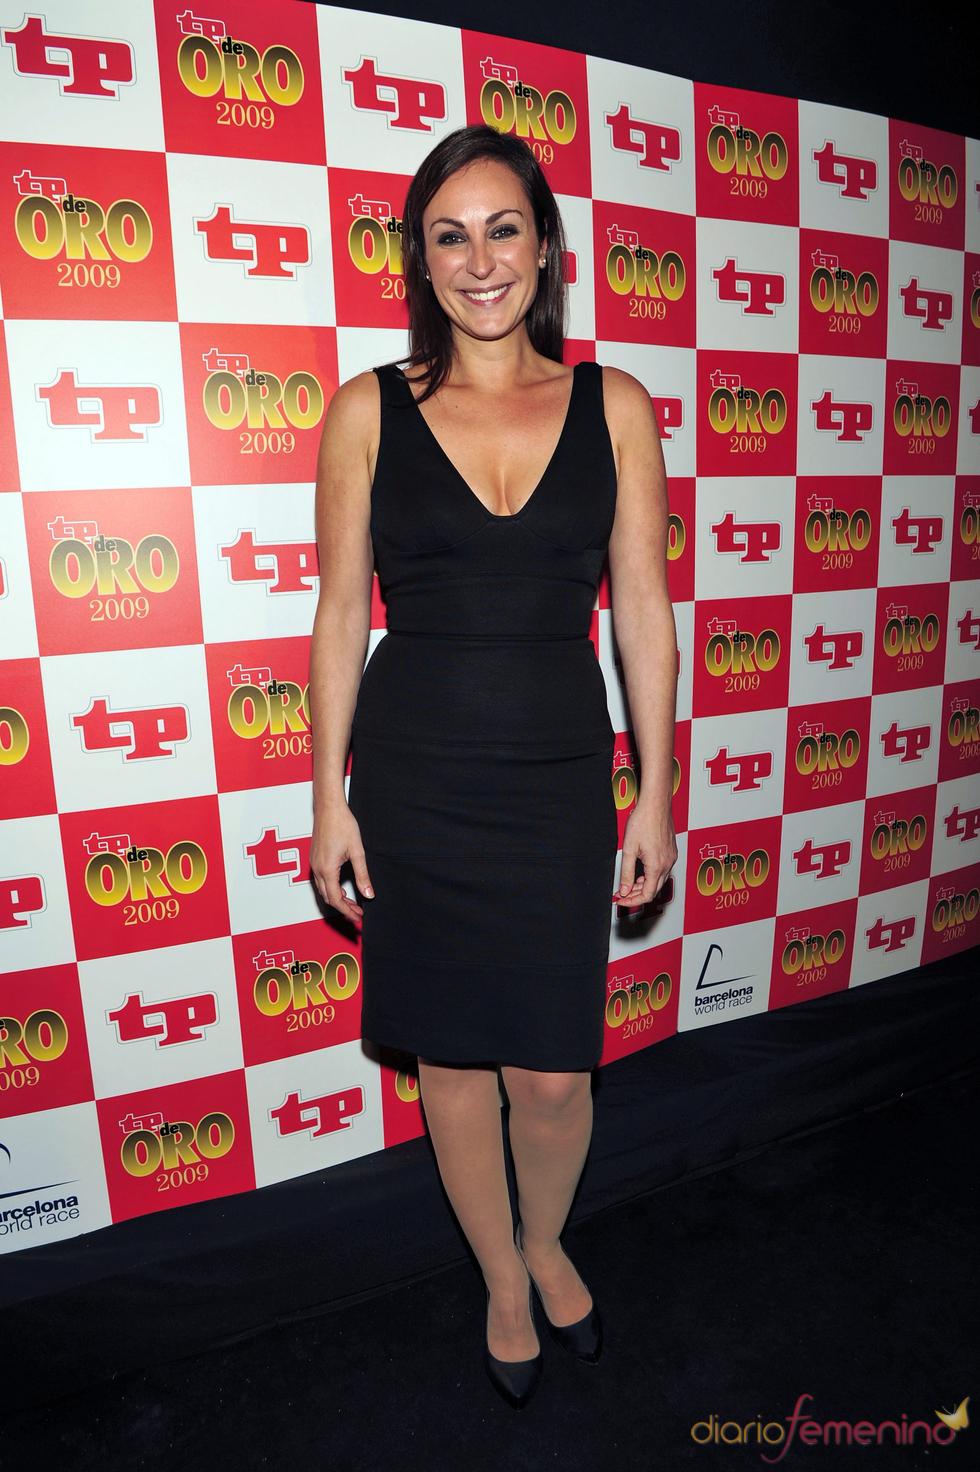 Ana Duato Piernas premios tp de oro 2009